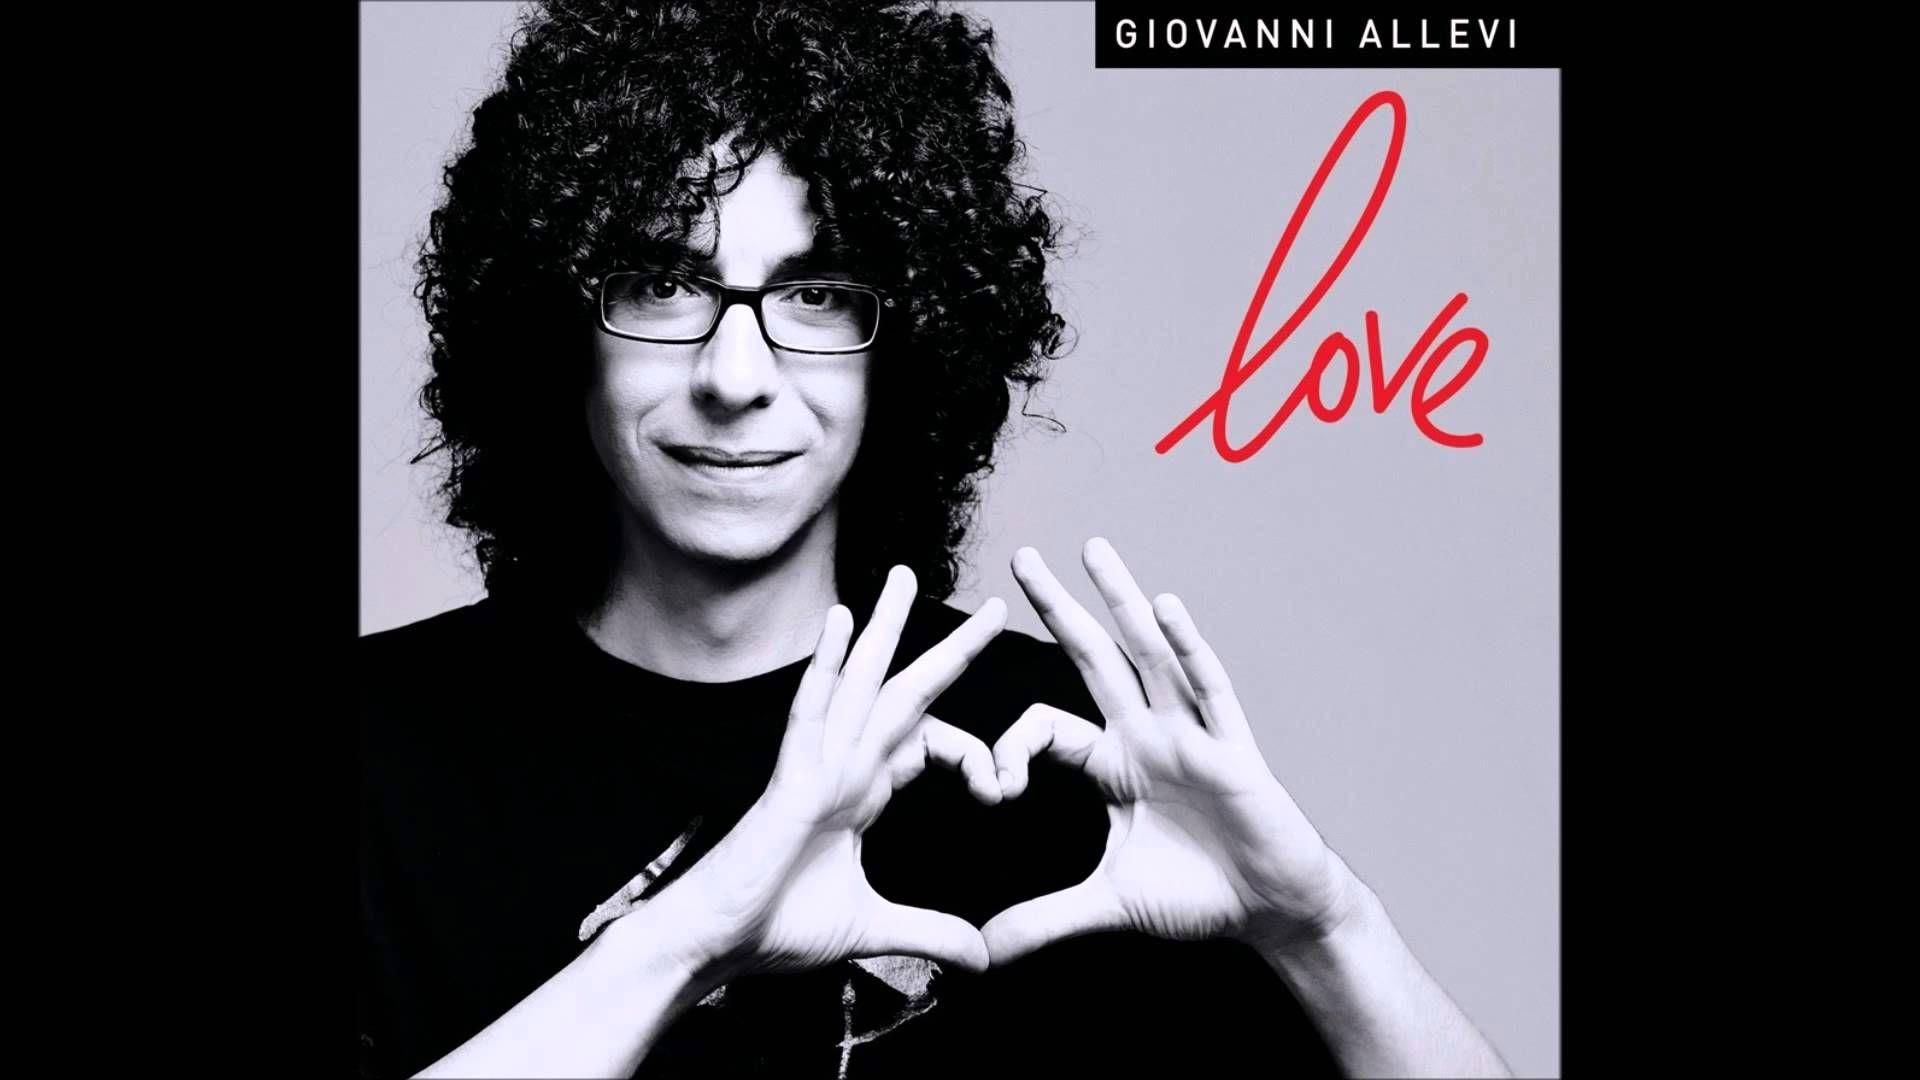 Giovanni Allevi - Loving You